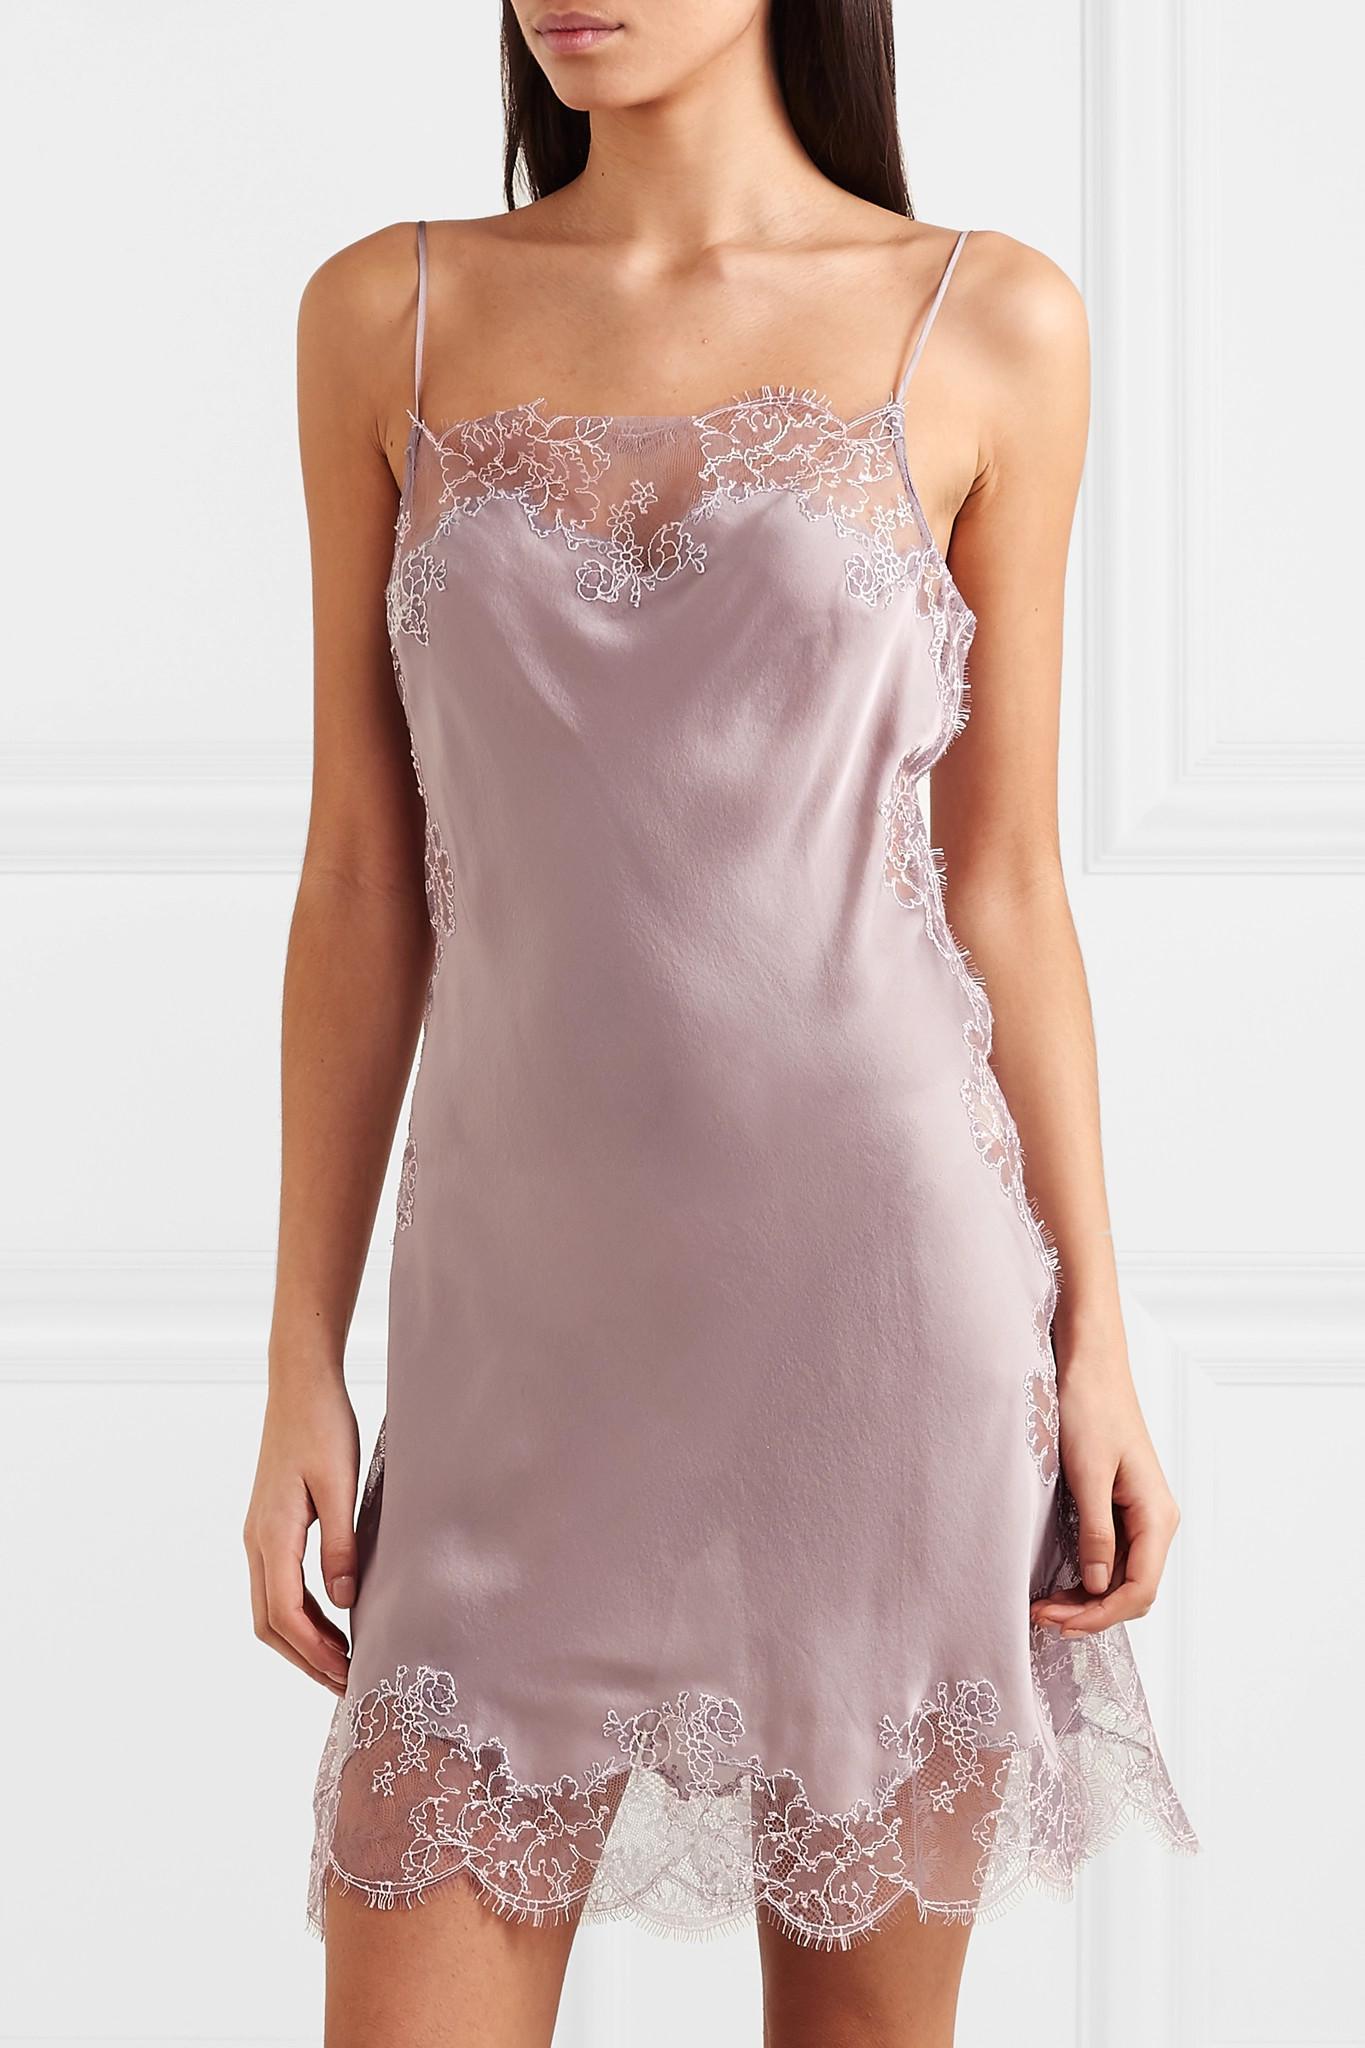 745cbf8719fa5 Carine Gilson - Purple Chantilly Lace-trimmed Silk-satin Chemise - Lyst.  View fullscreen